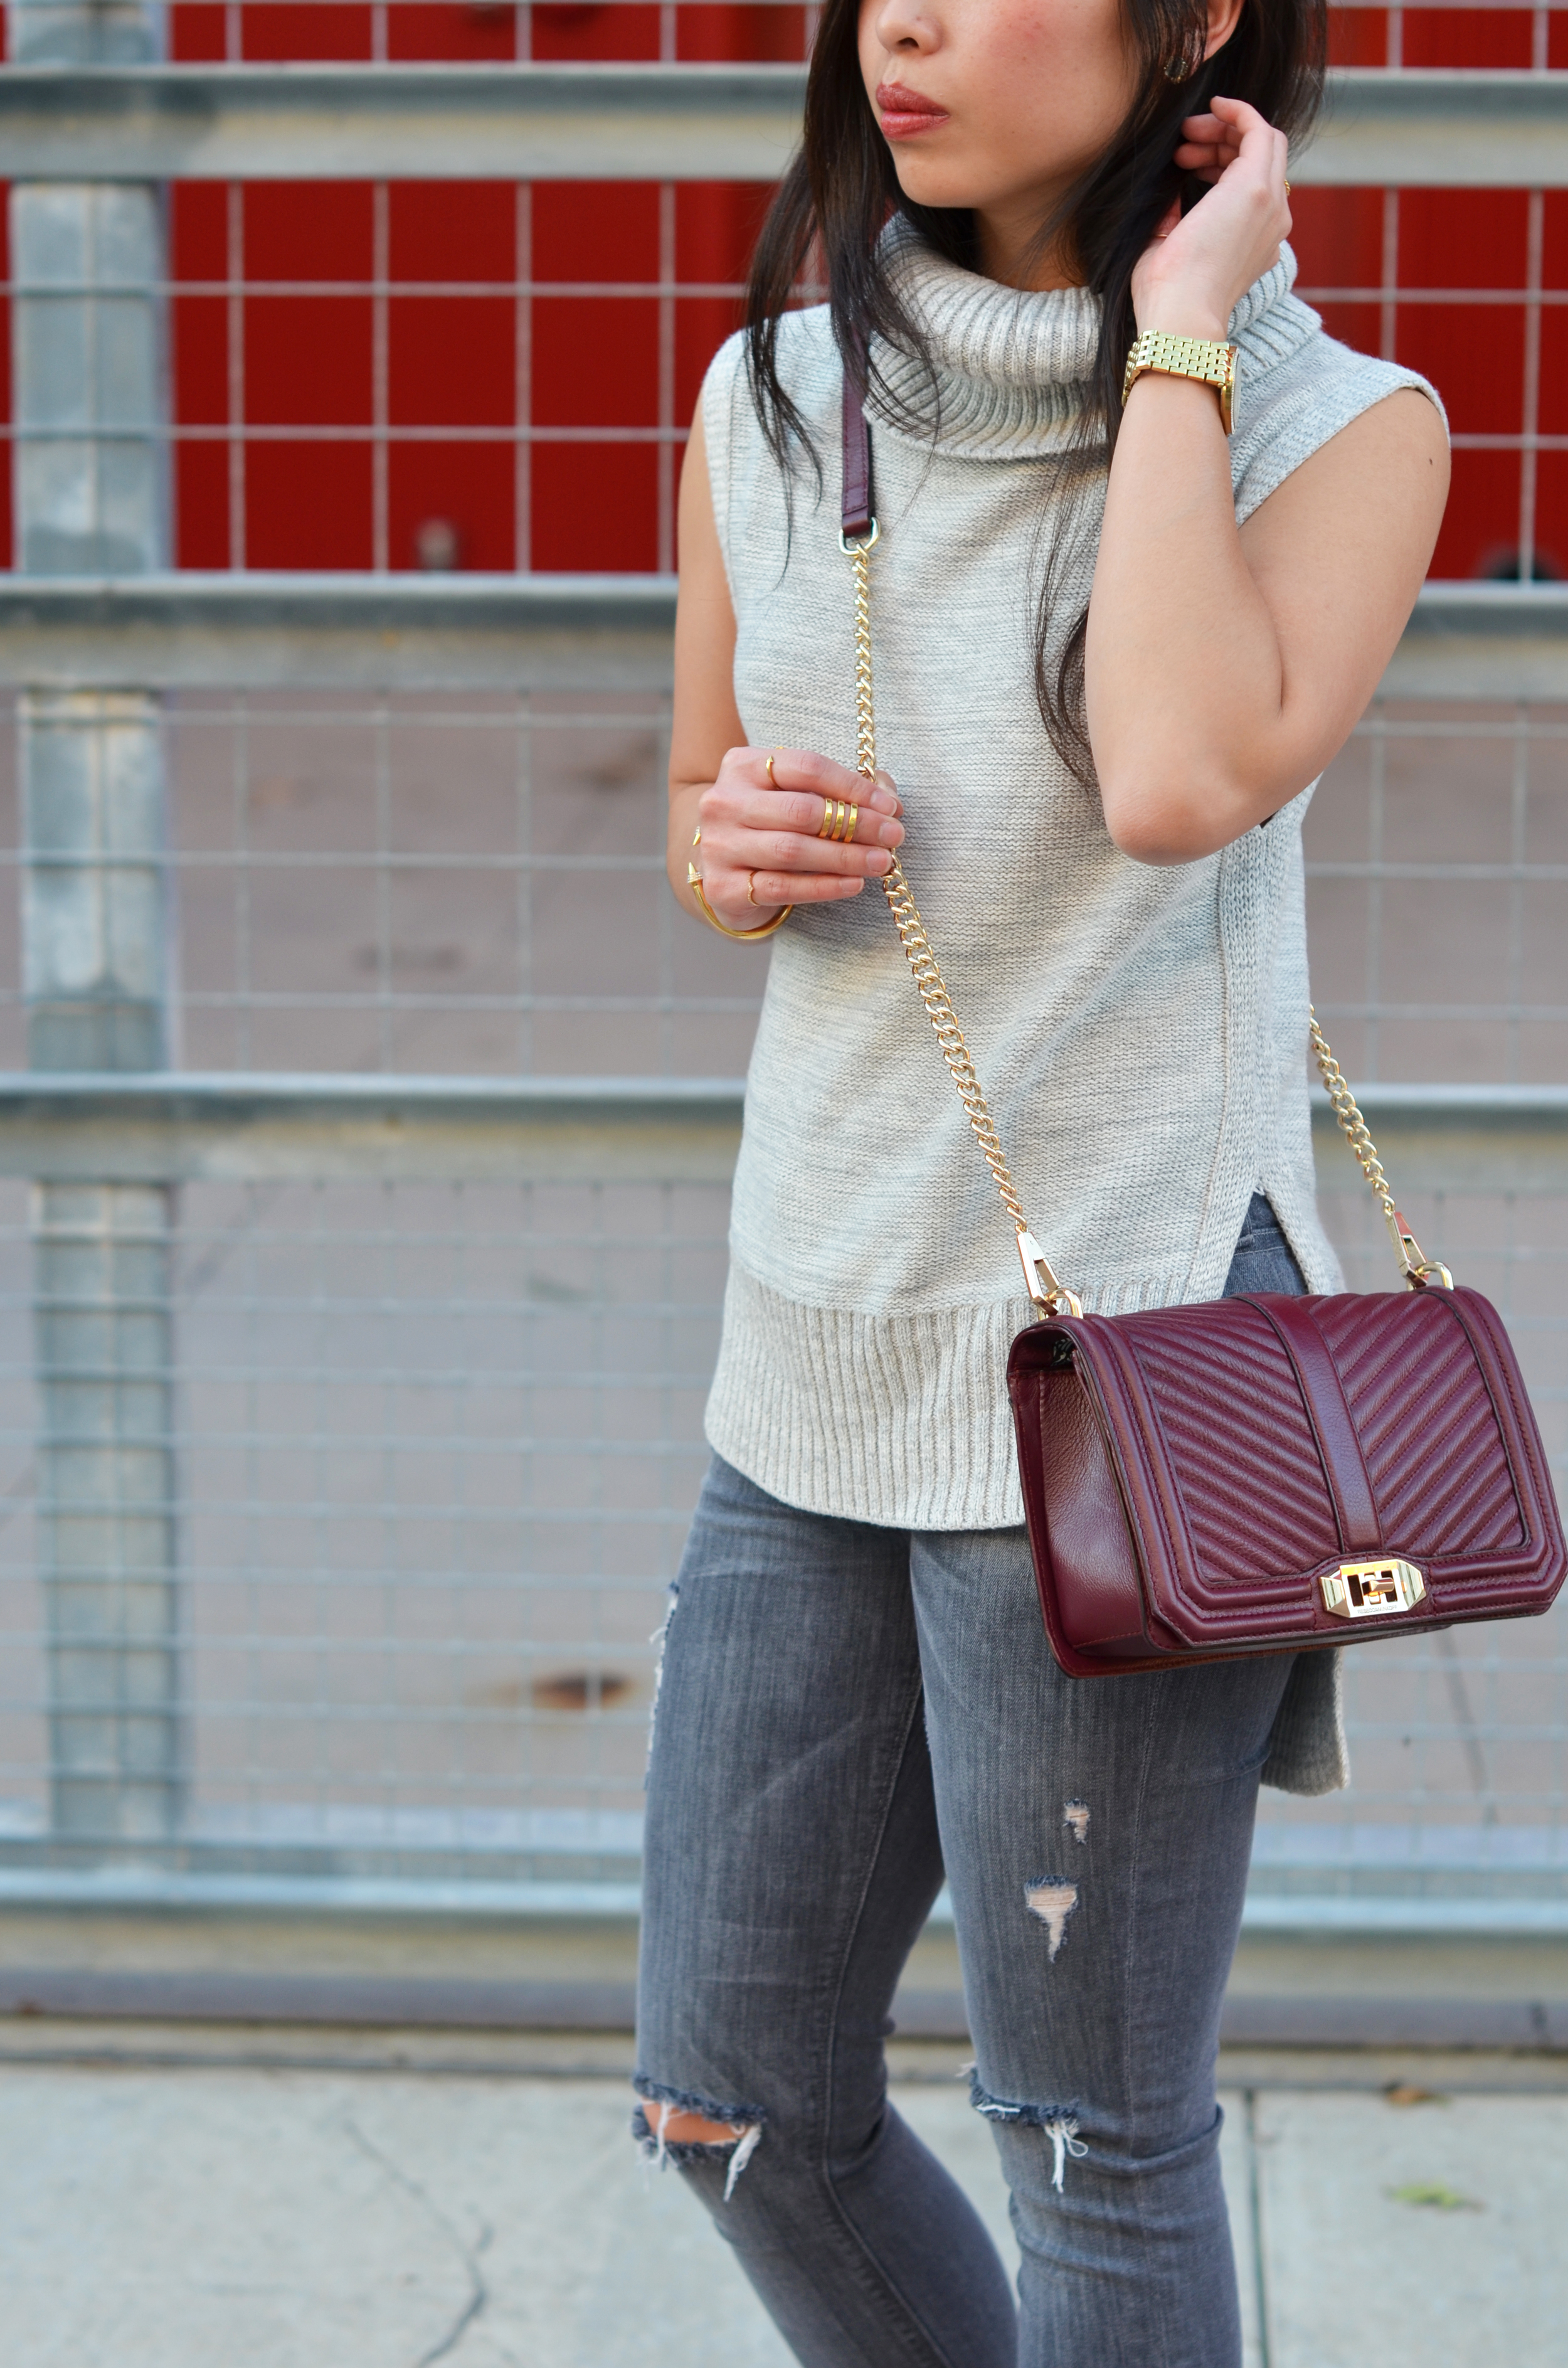 the sleeveless turtleneck & grey jeans -- jannadoan.com